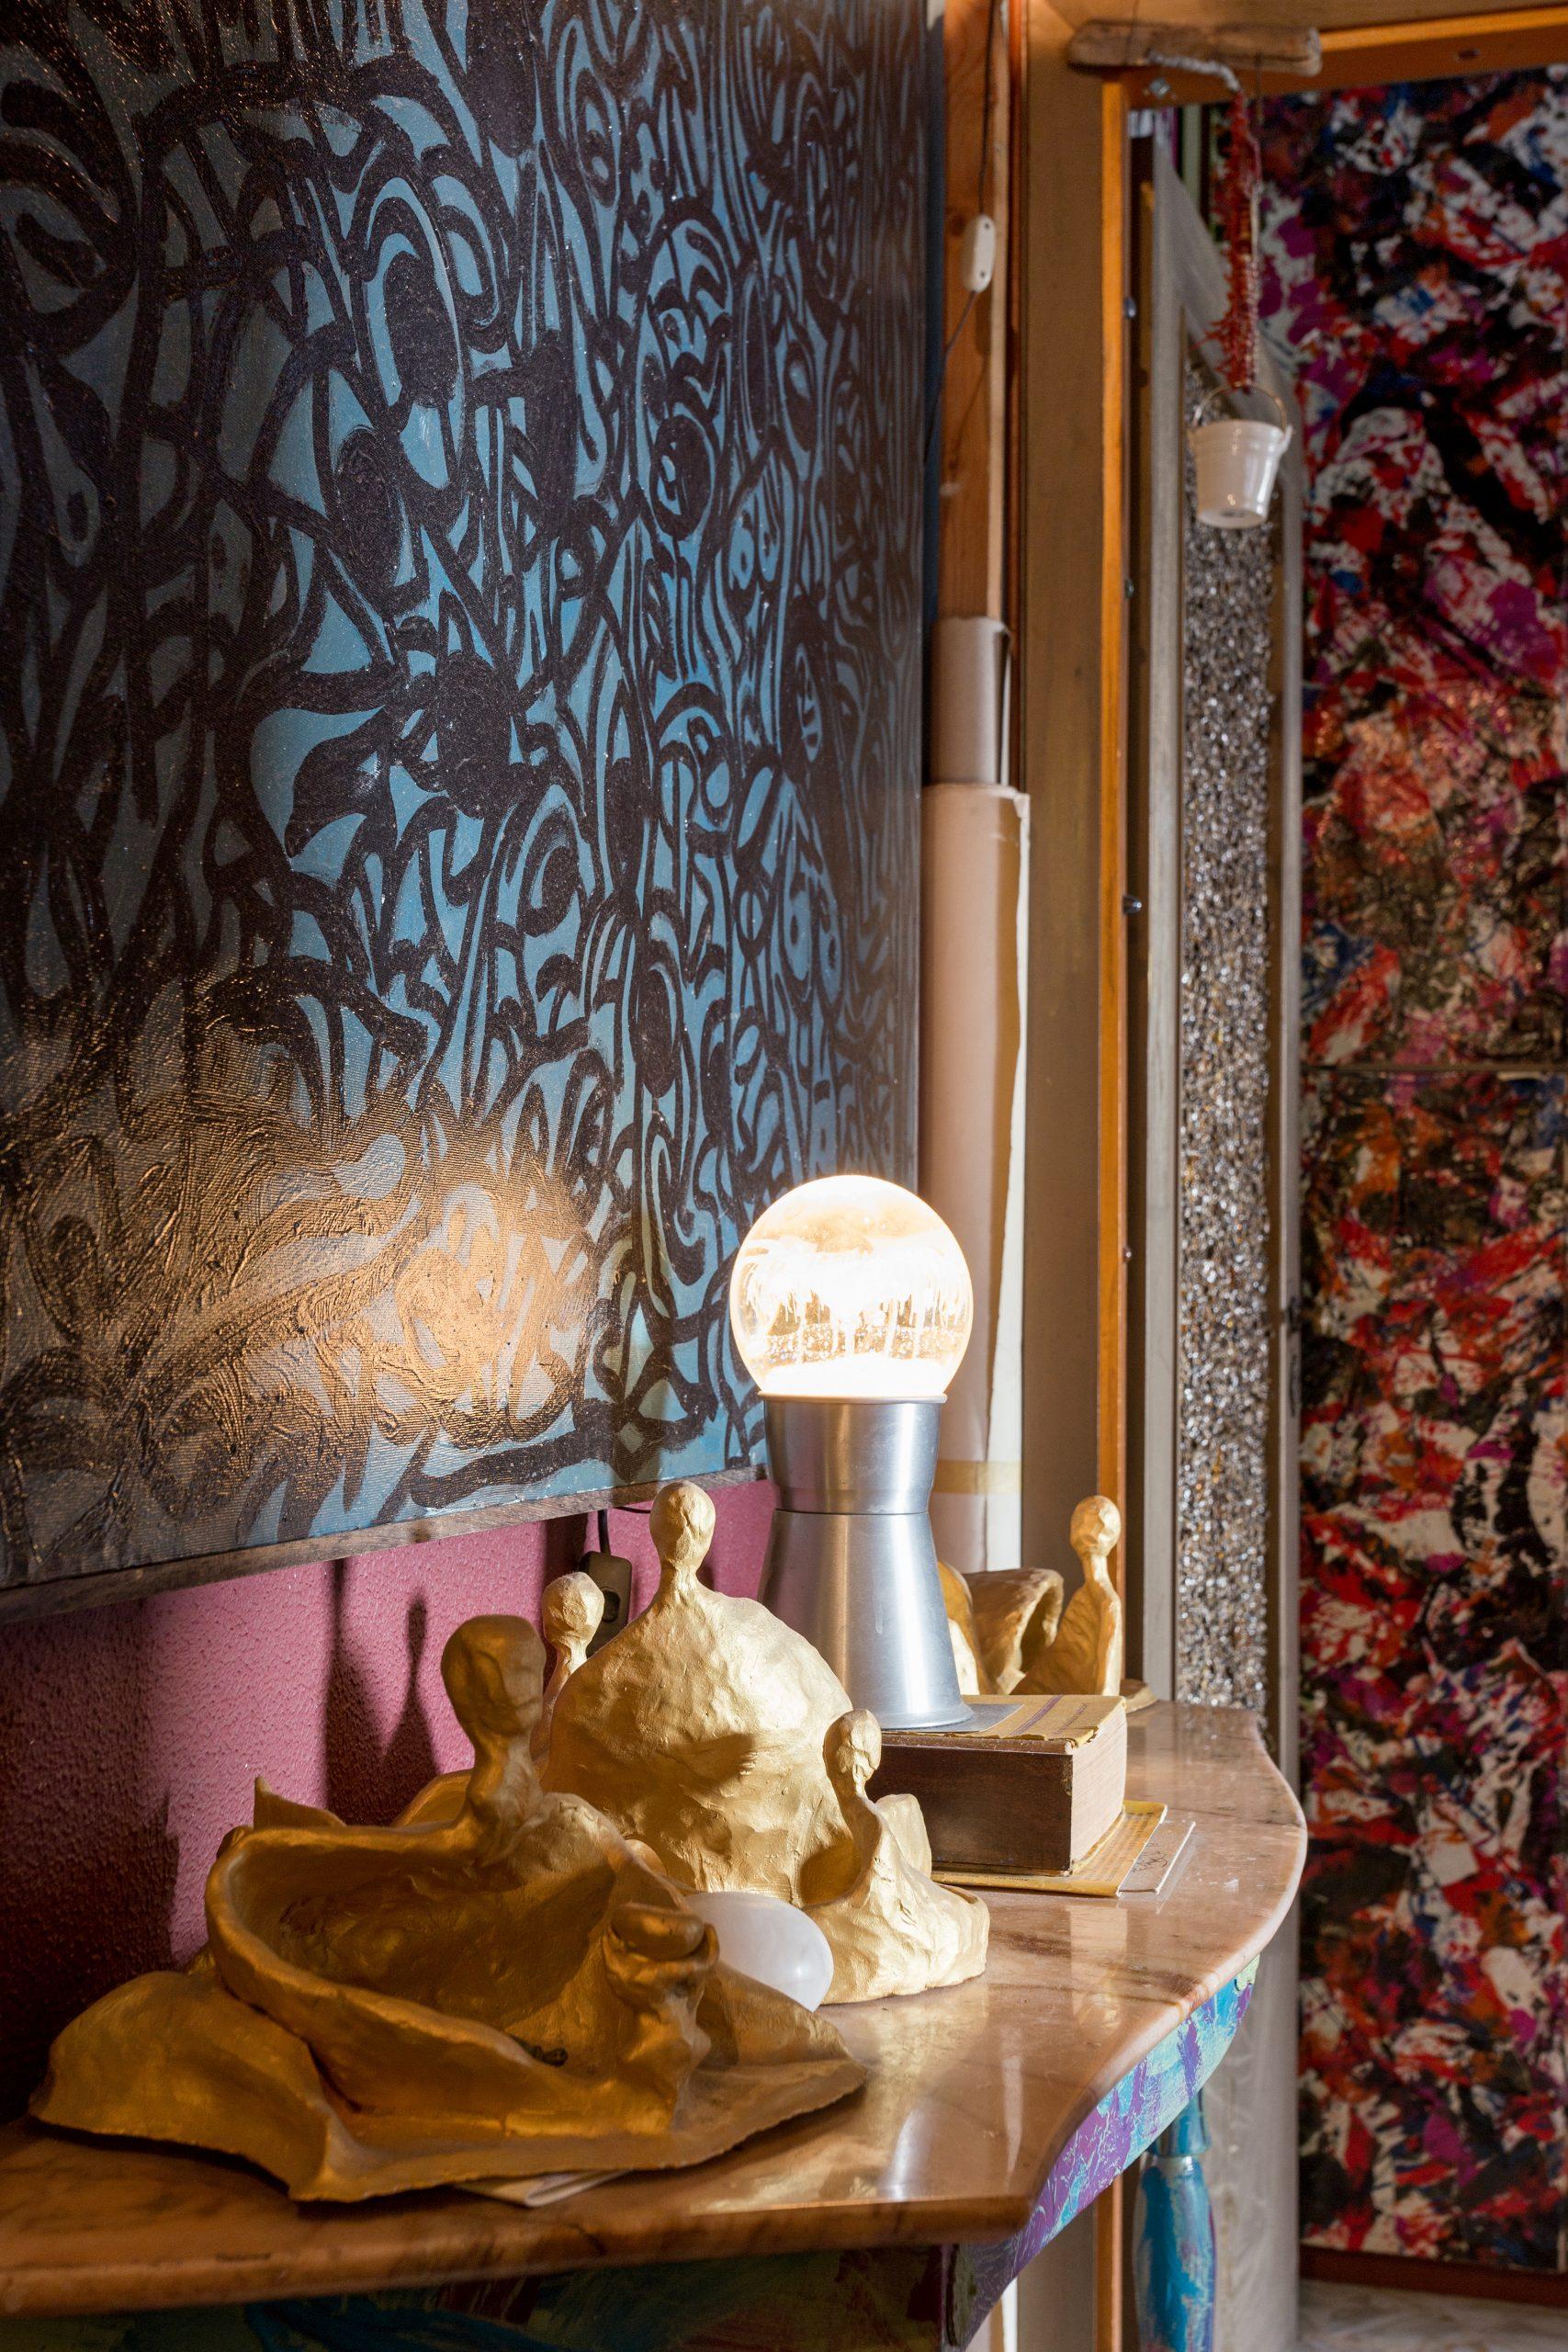 corpi d'argilla dipinti d'oro sicily contemporary artist